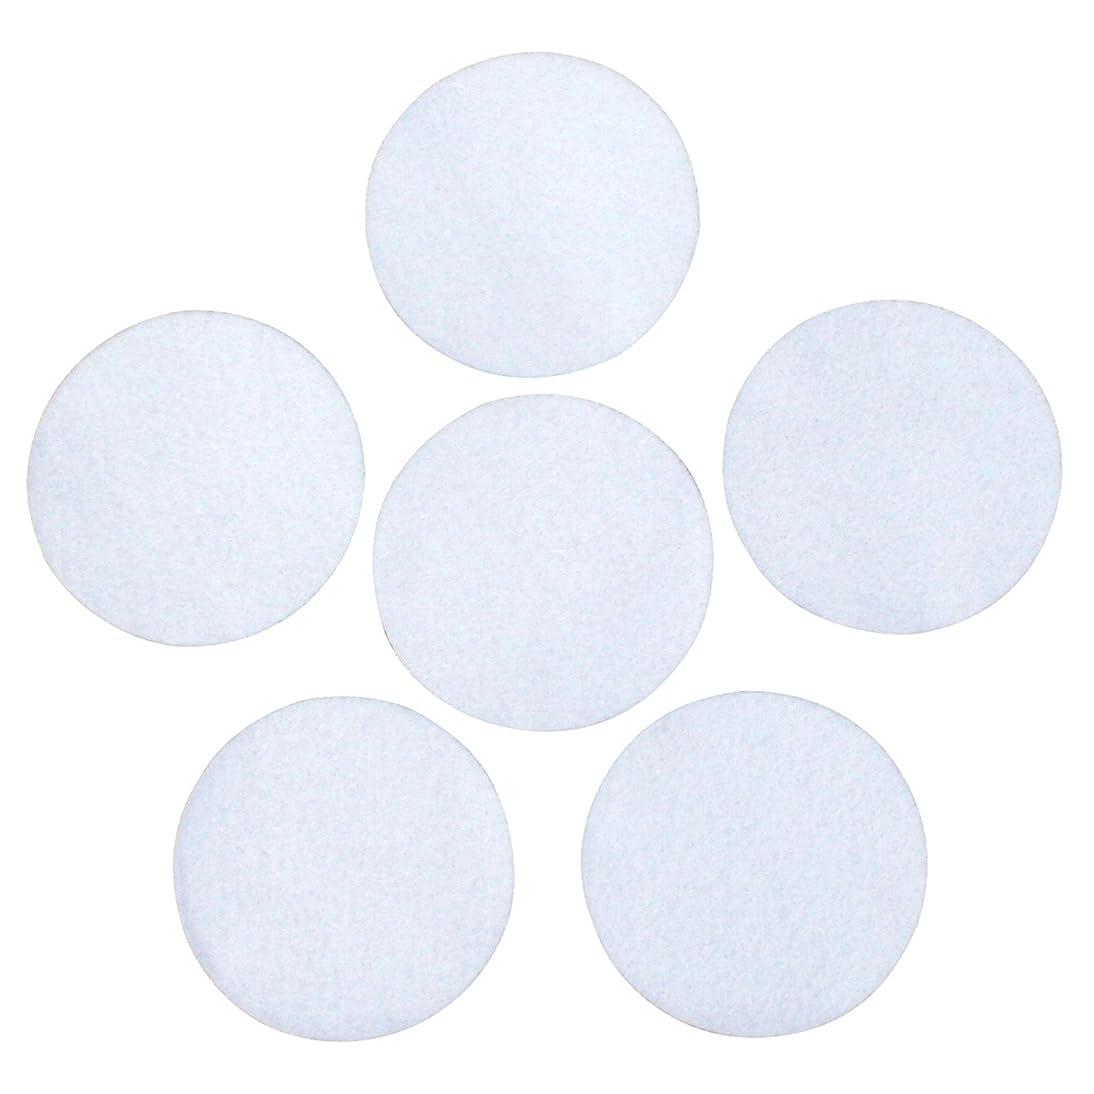 White Adhesive Felt Circles 2 inch, 3